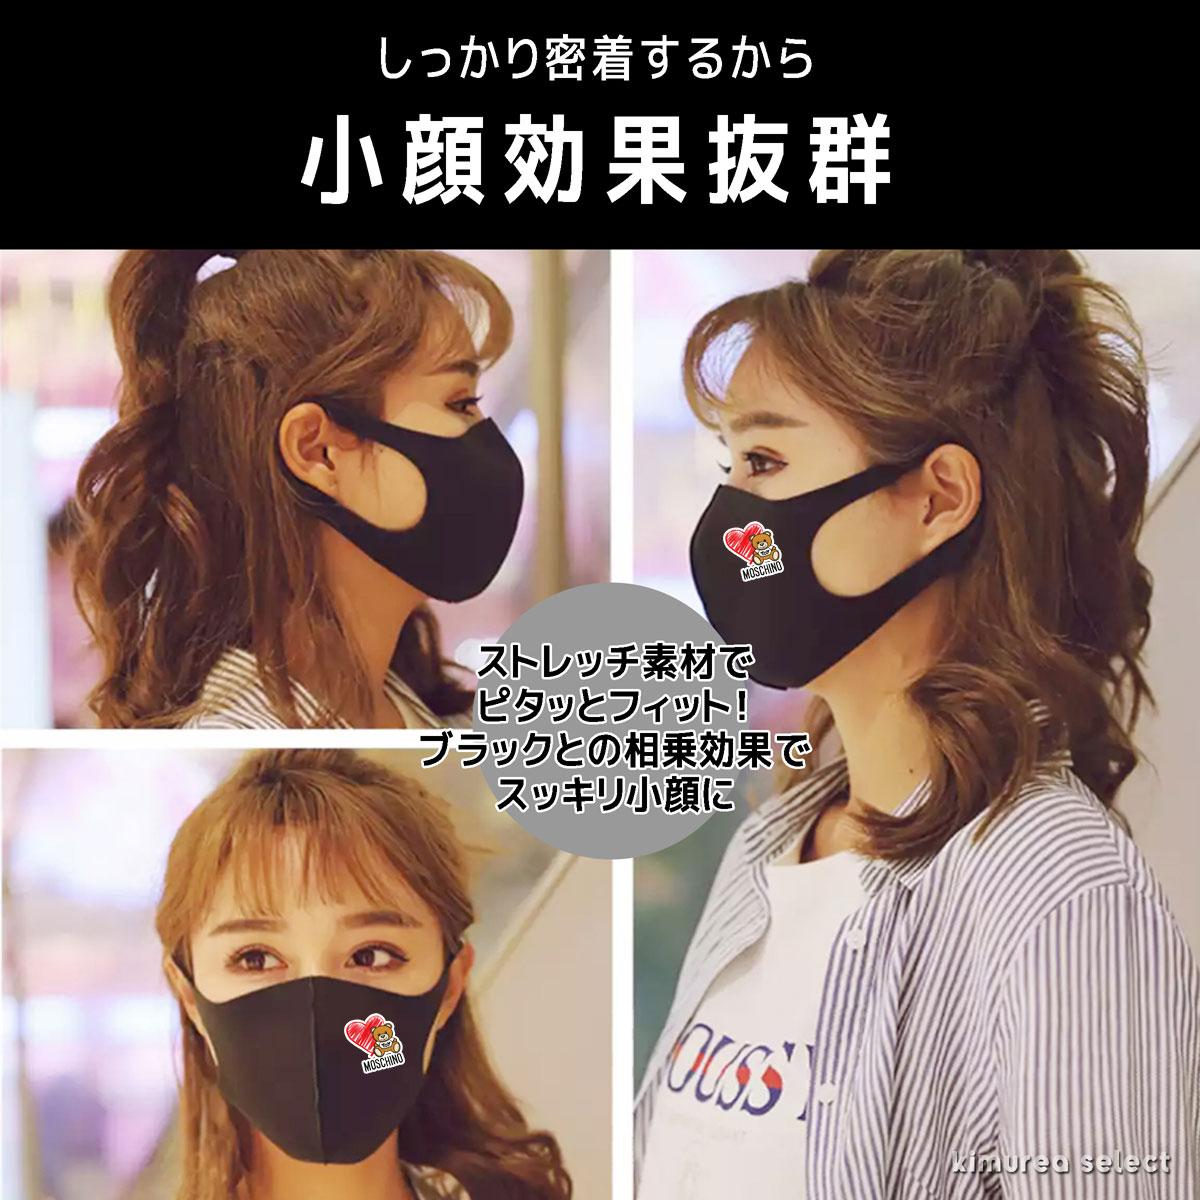 Moschino 3D facemasks reusable washable cotton masks